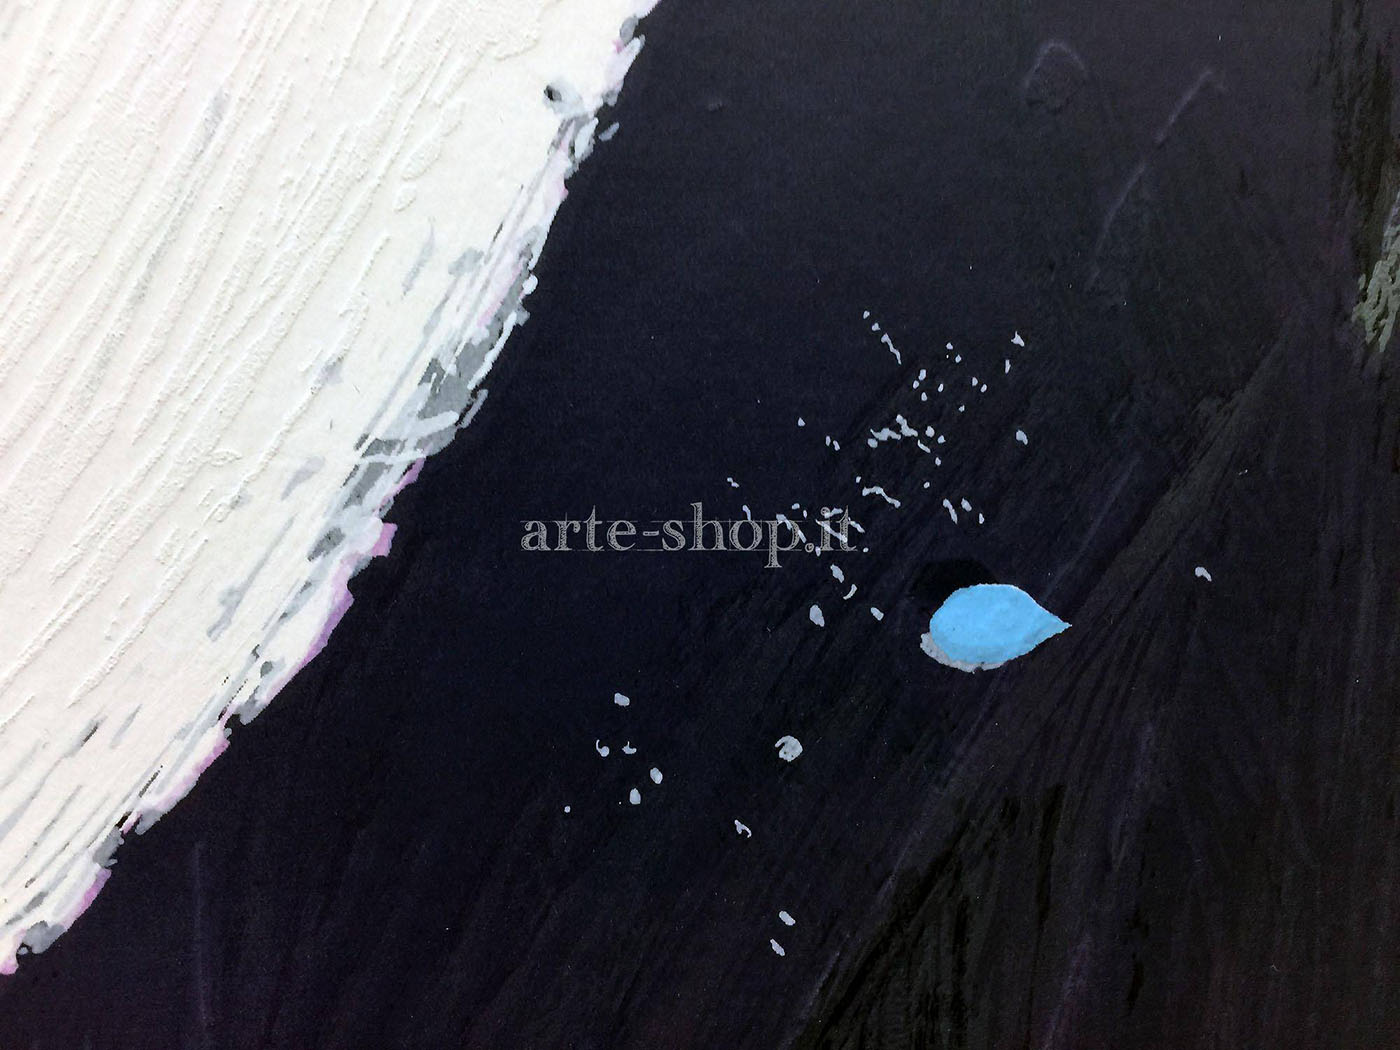 arte pentagono shop dettaglio numero 1113